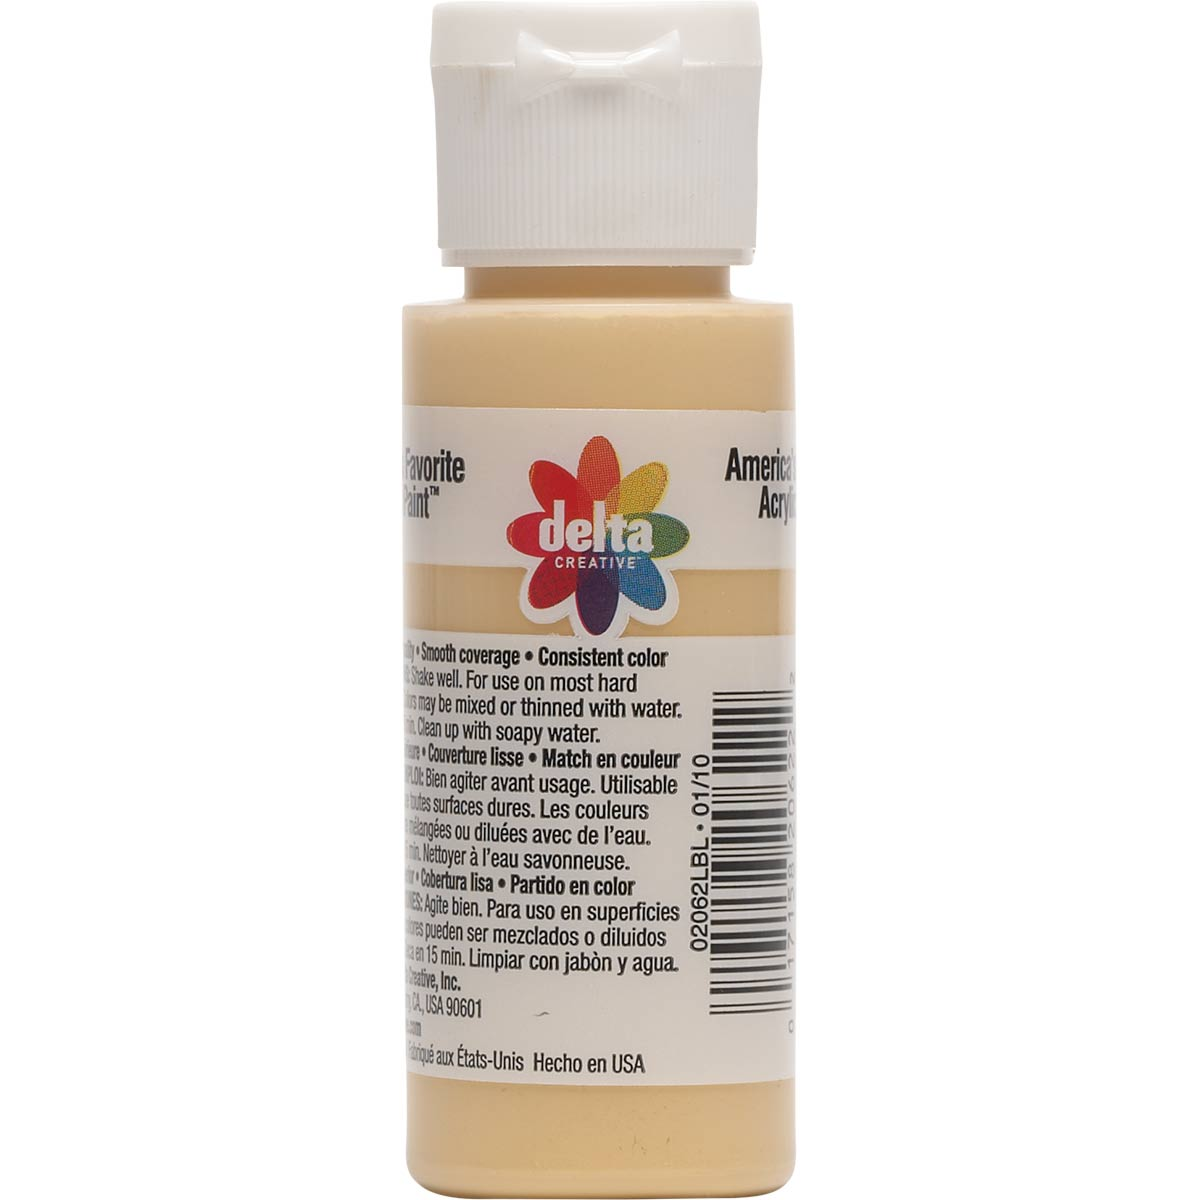 Delta Ceramcoat ® Acrylic Paint - Maple Sugar Tan, 2 oz. - 020620202W